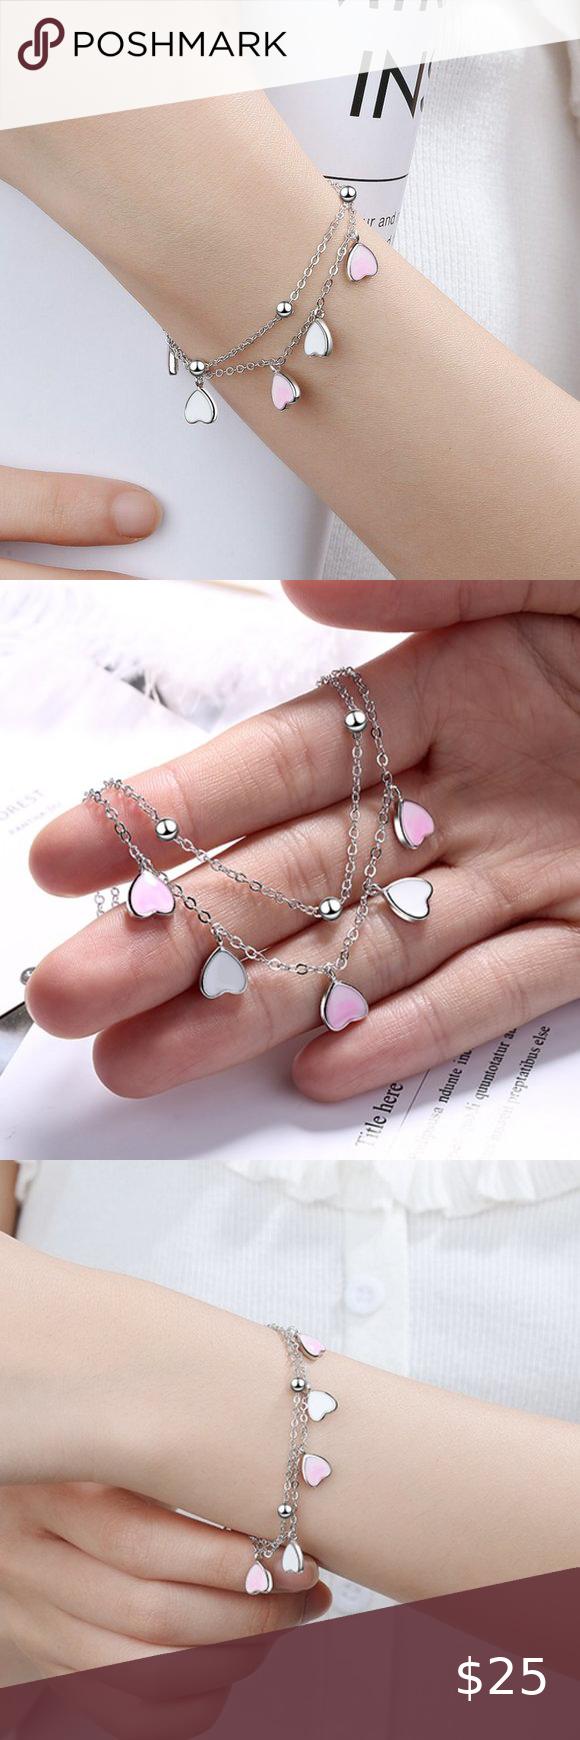 Unique 18K Gold Pearl Bracelet for Women 925 Sterling Silver Fashion Jewelry